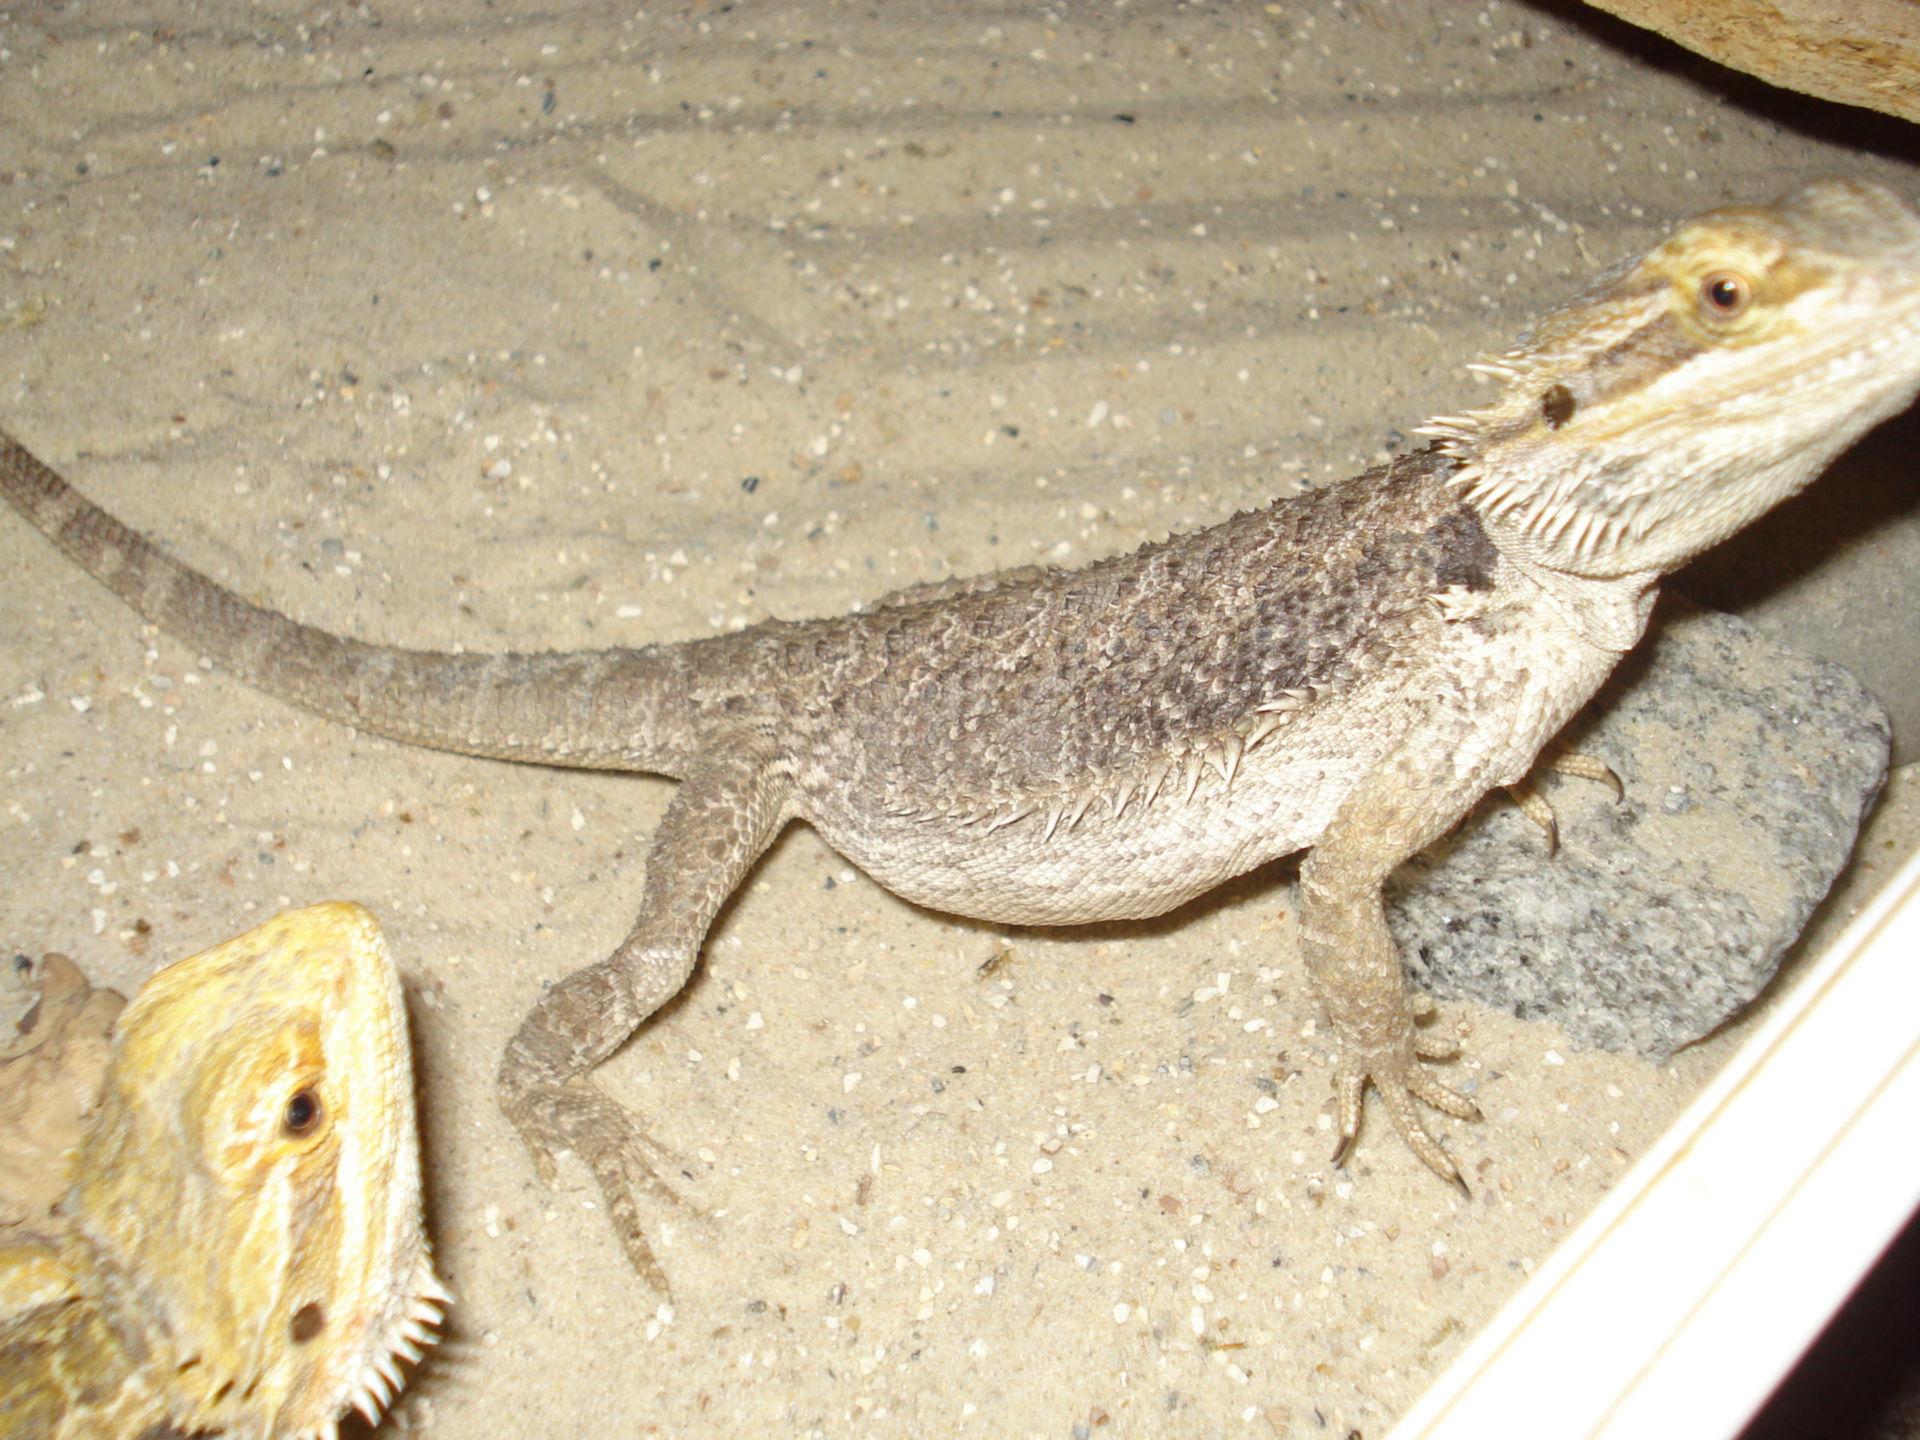 Veterinary Medicine: Female Bearded Dragon